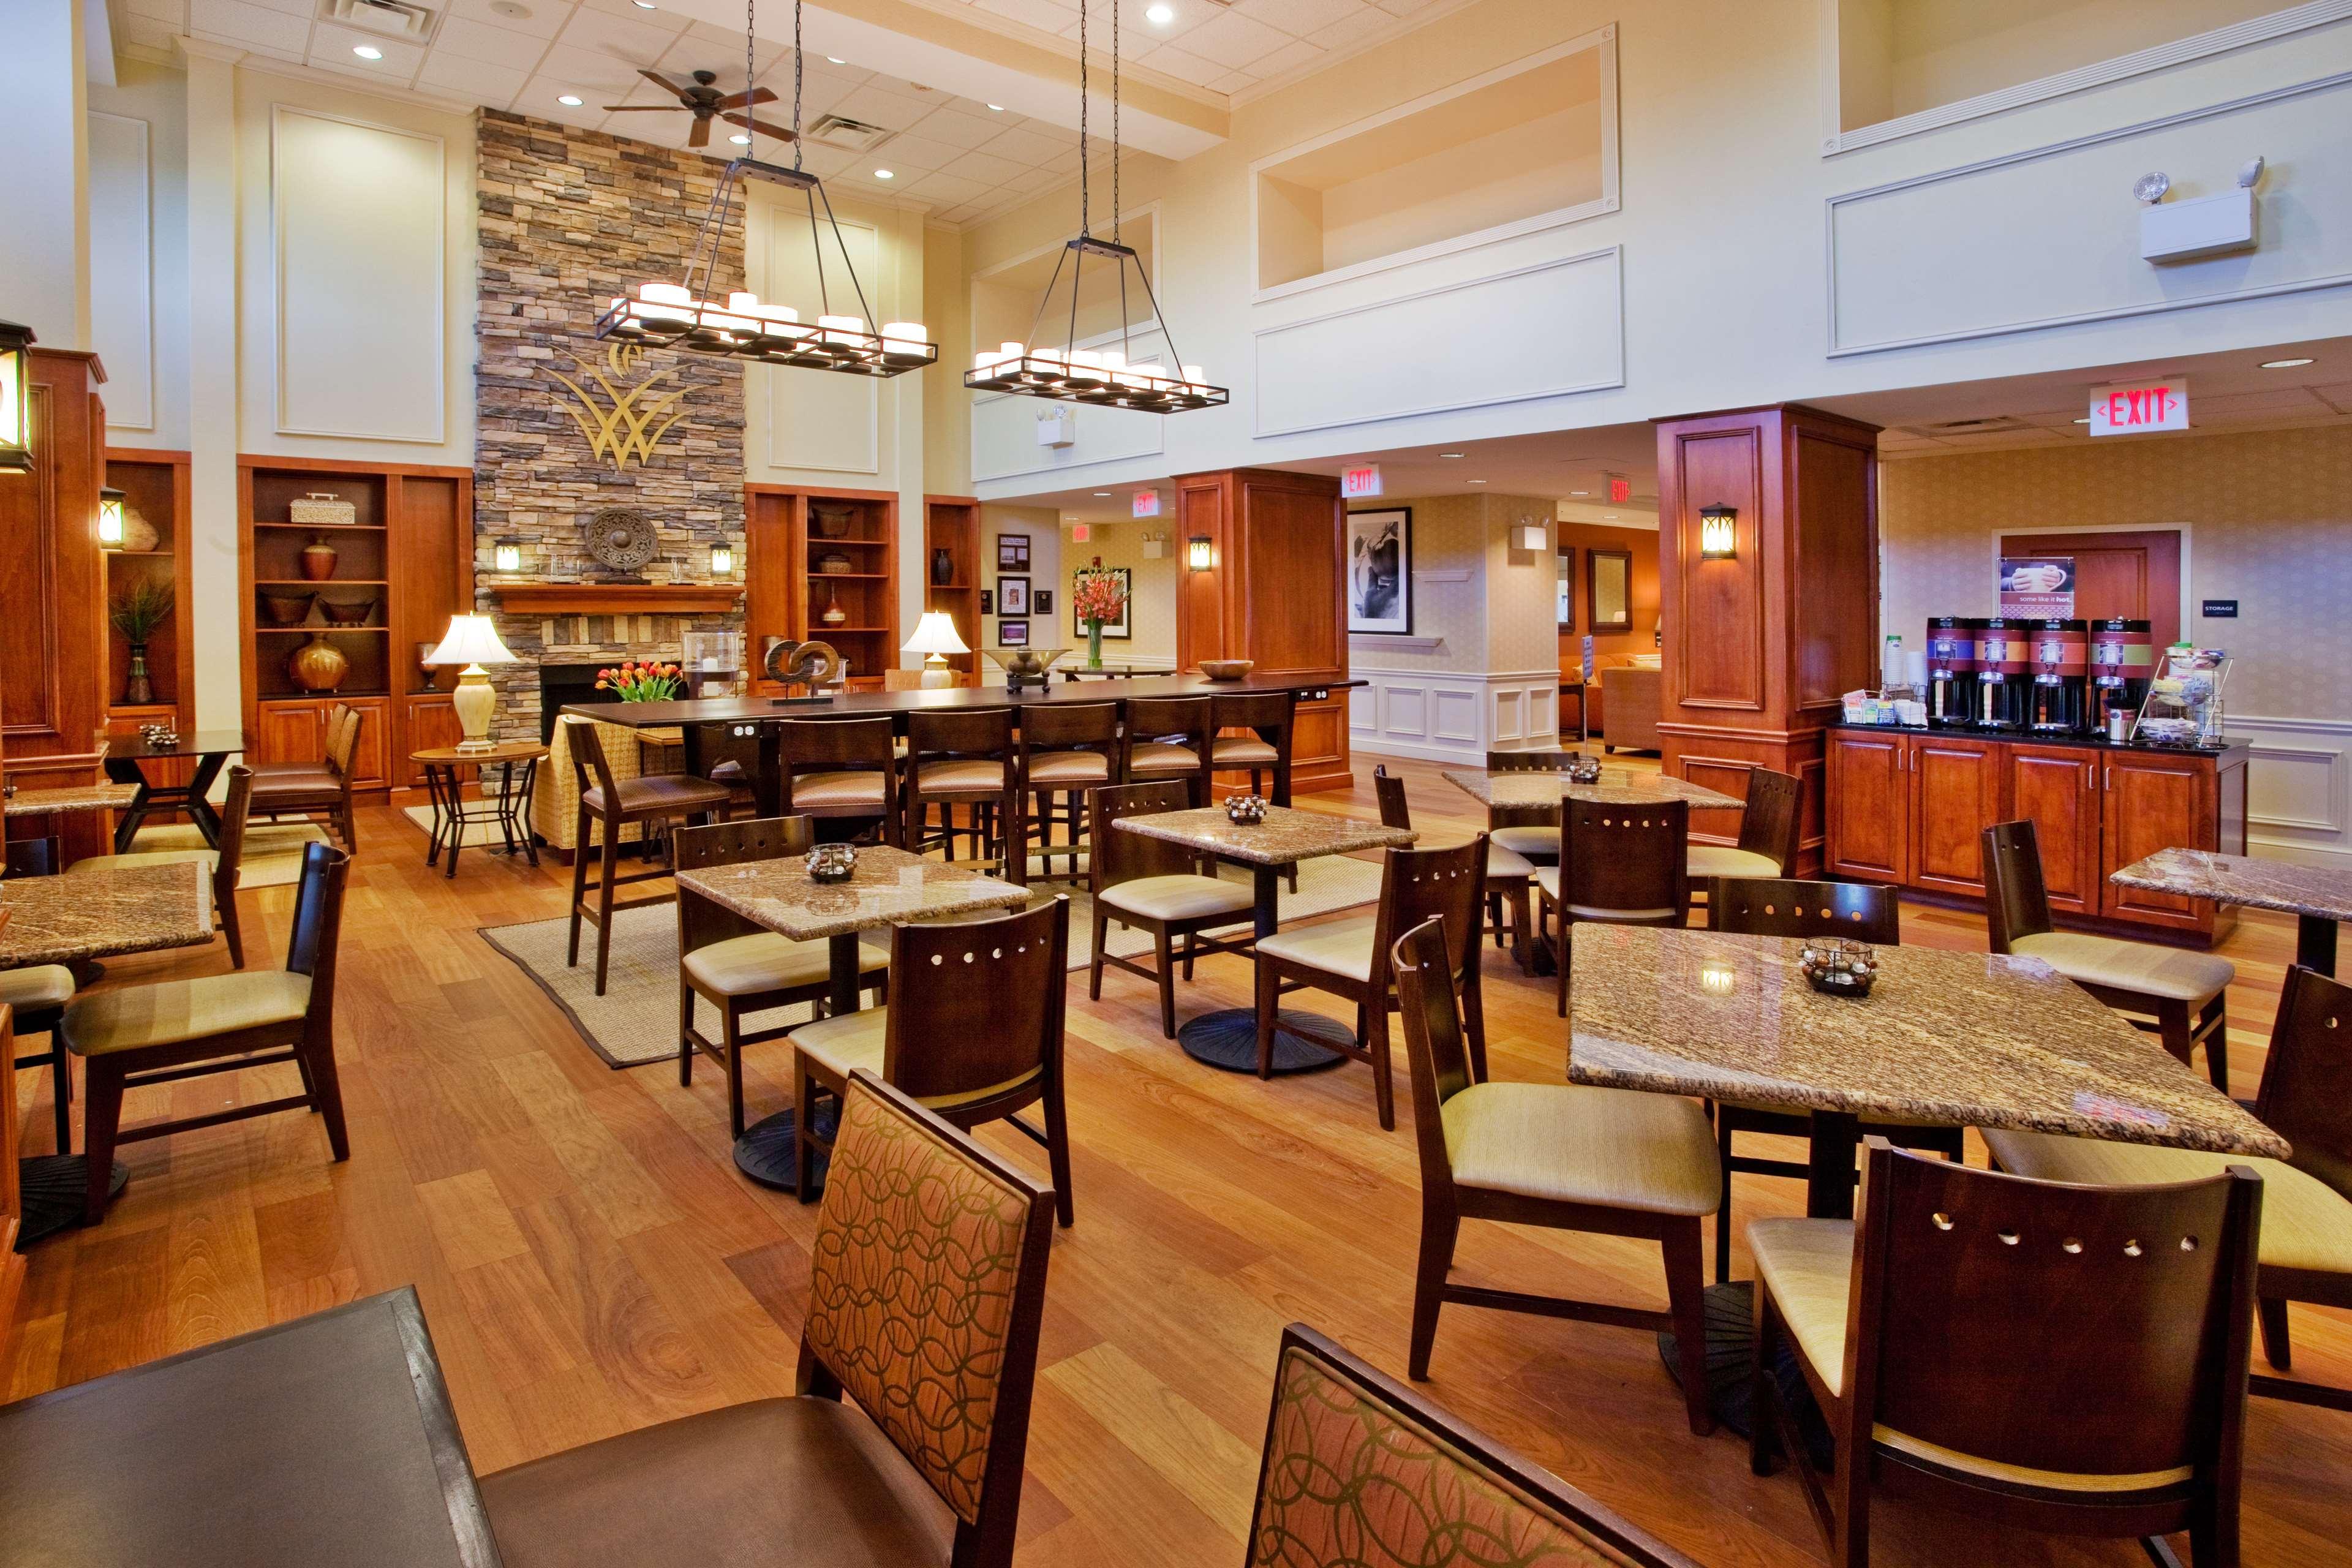 Hampton Inn & Suites Lanett-West Point image 14